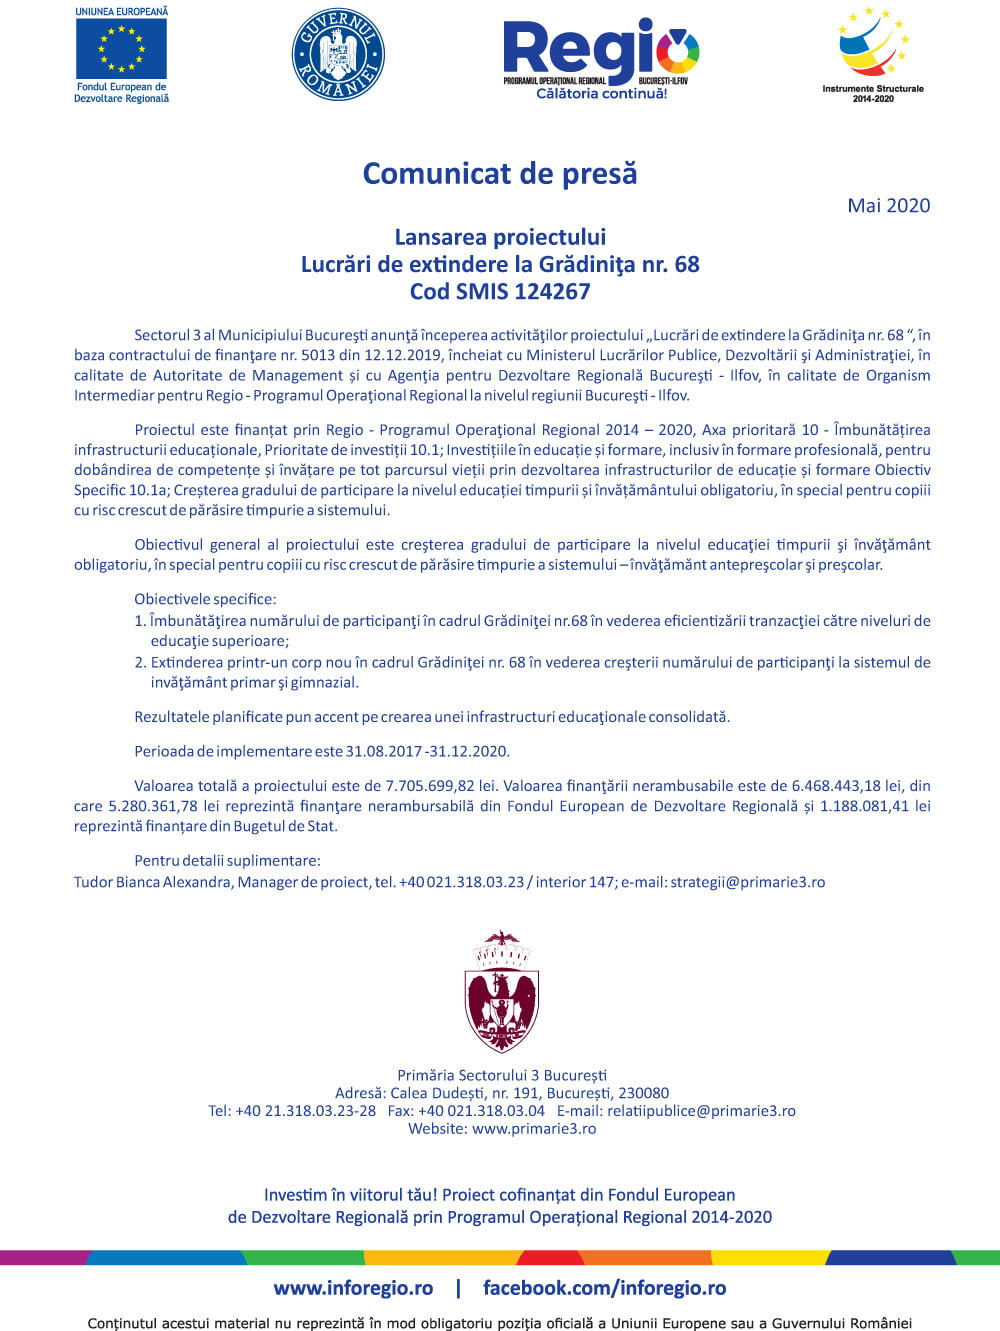 comunicat-de-presa-bucuresti-gradinita-68